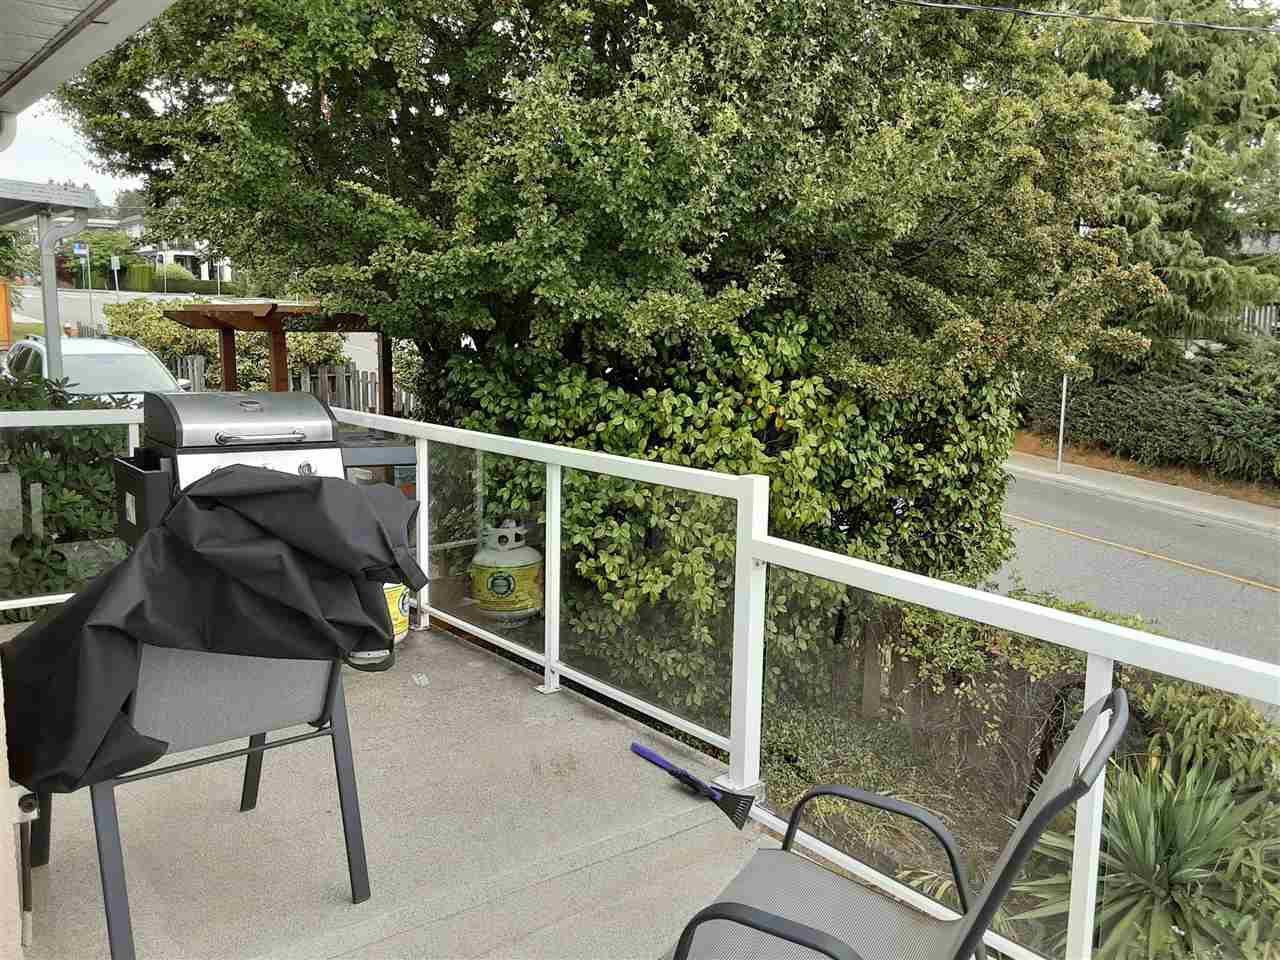 Photo 18: Photos: 15291 COLUMBIA Avenue: White Rock House for sale (South Surrey White Rock)  : MLS®# R2492863